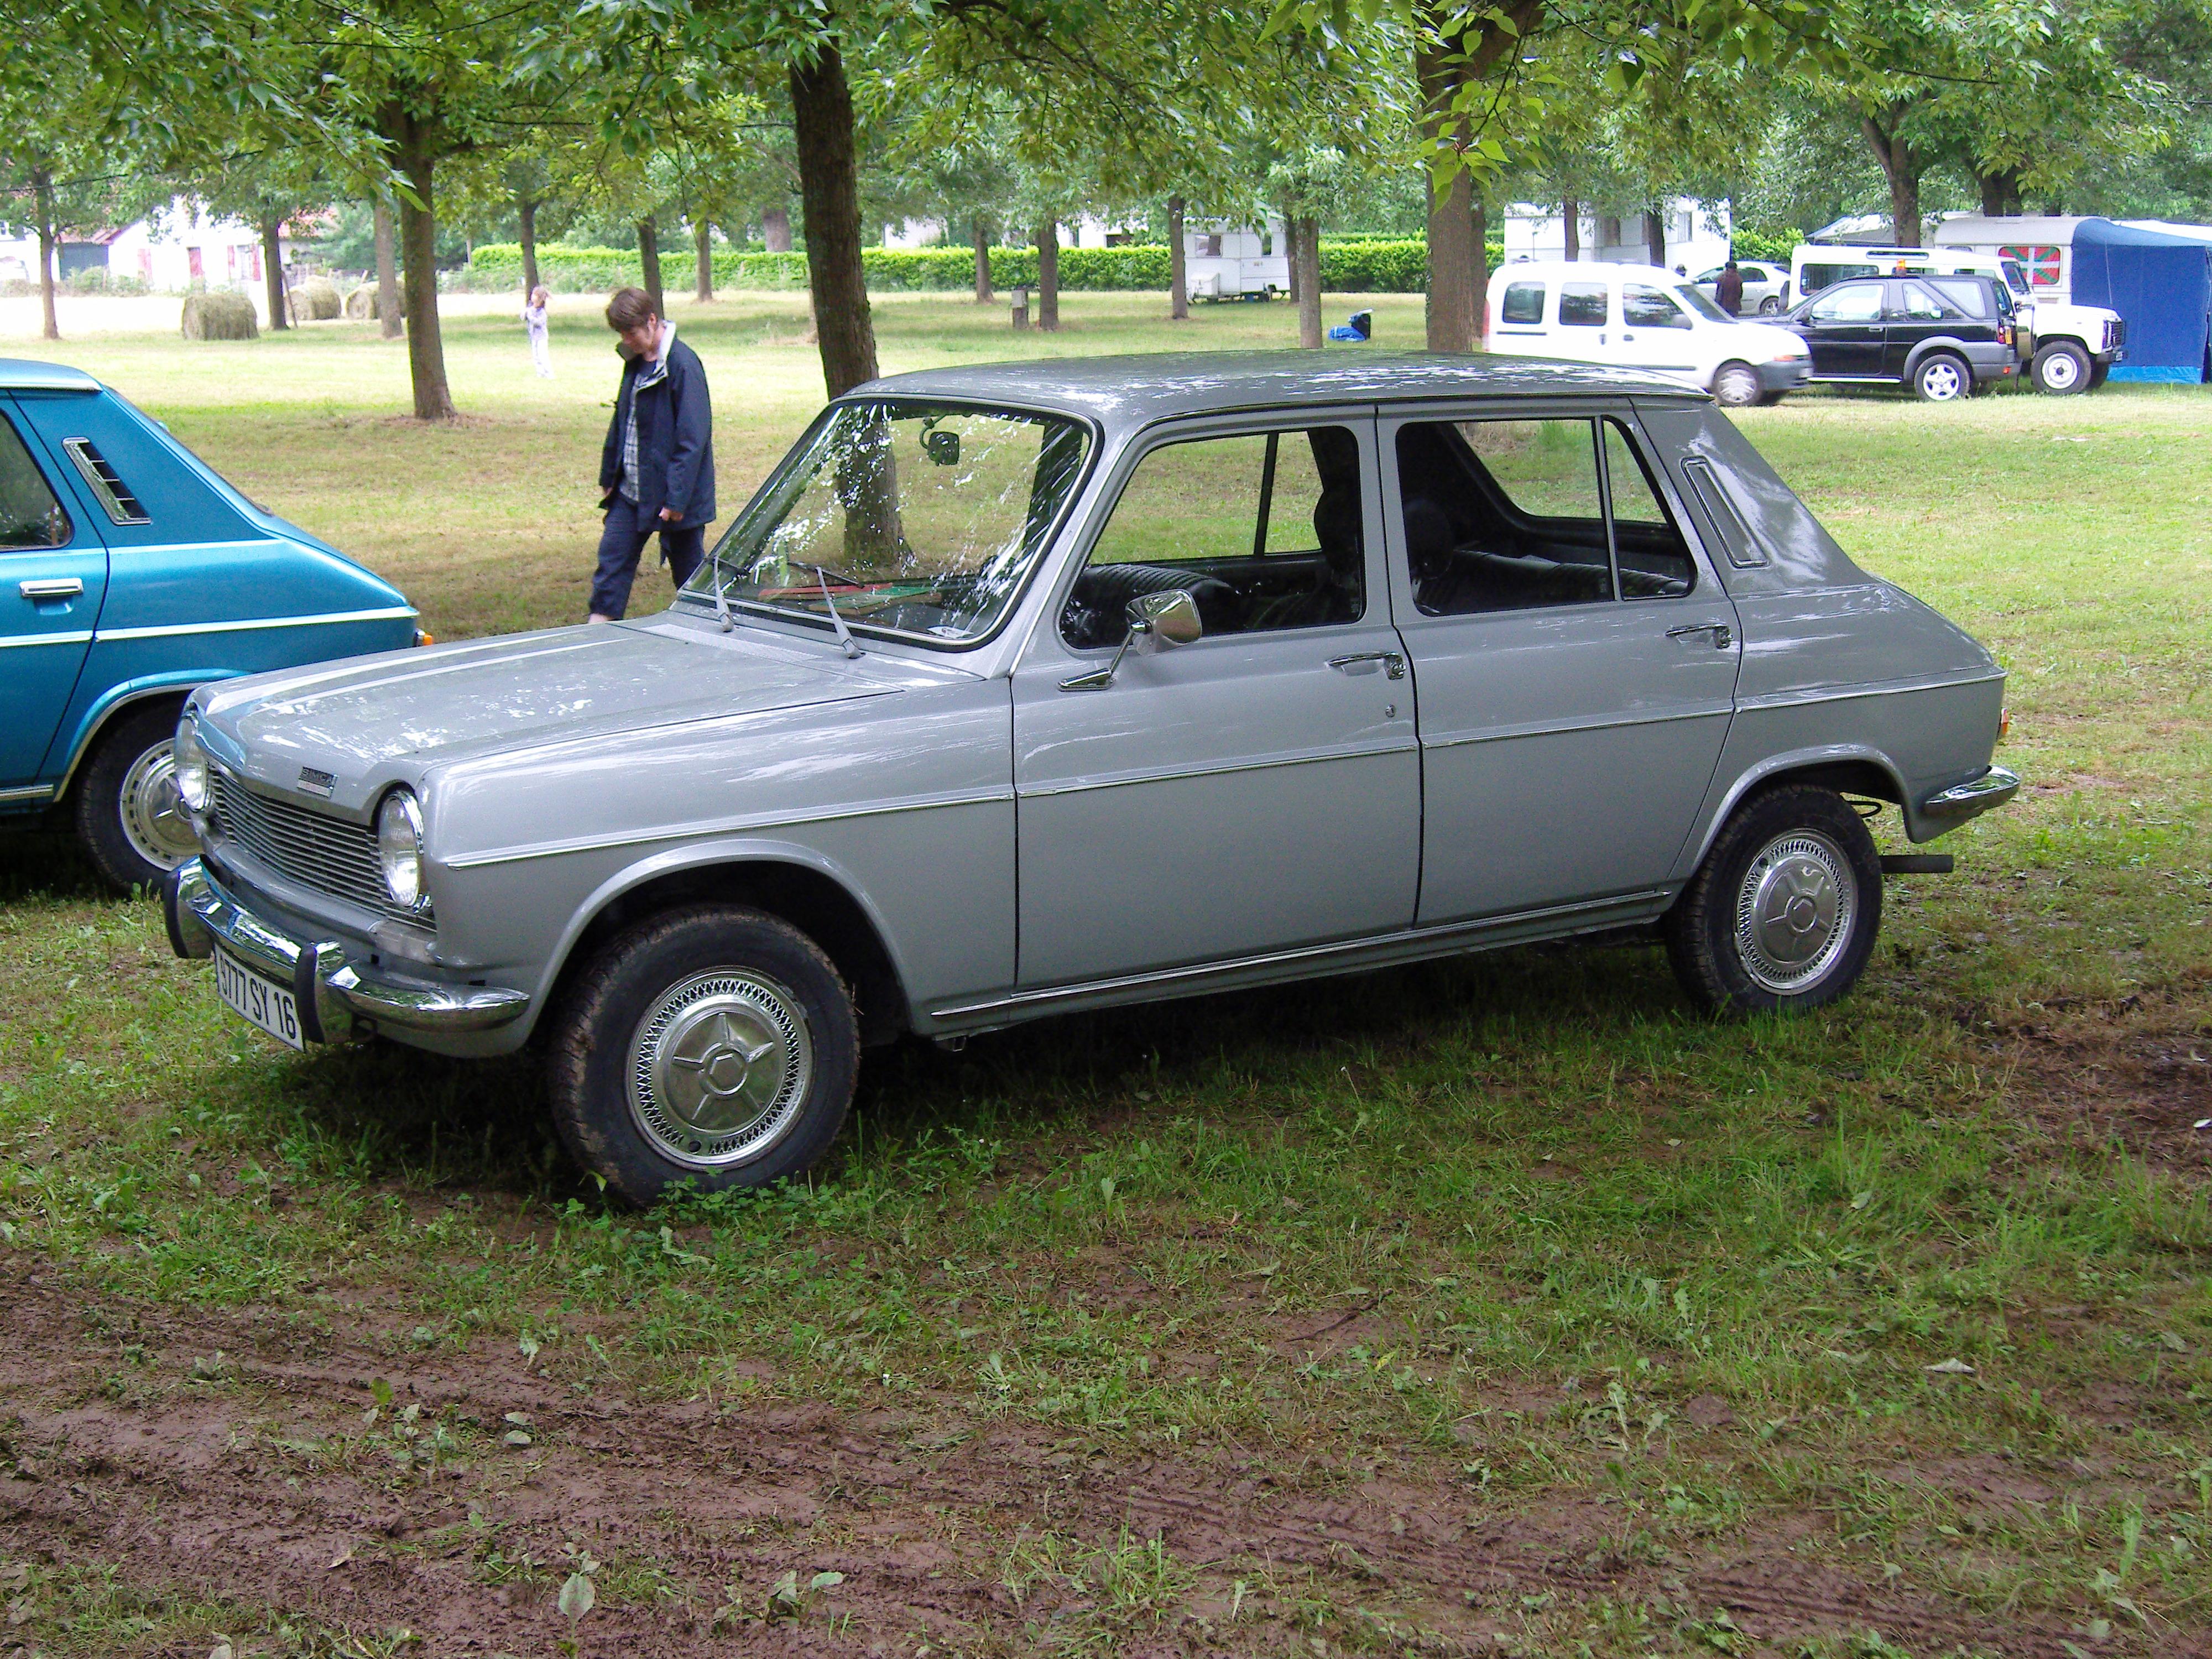 Free Images : old, vintage, french, auto, motor vehicle, hatchback ...